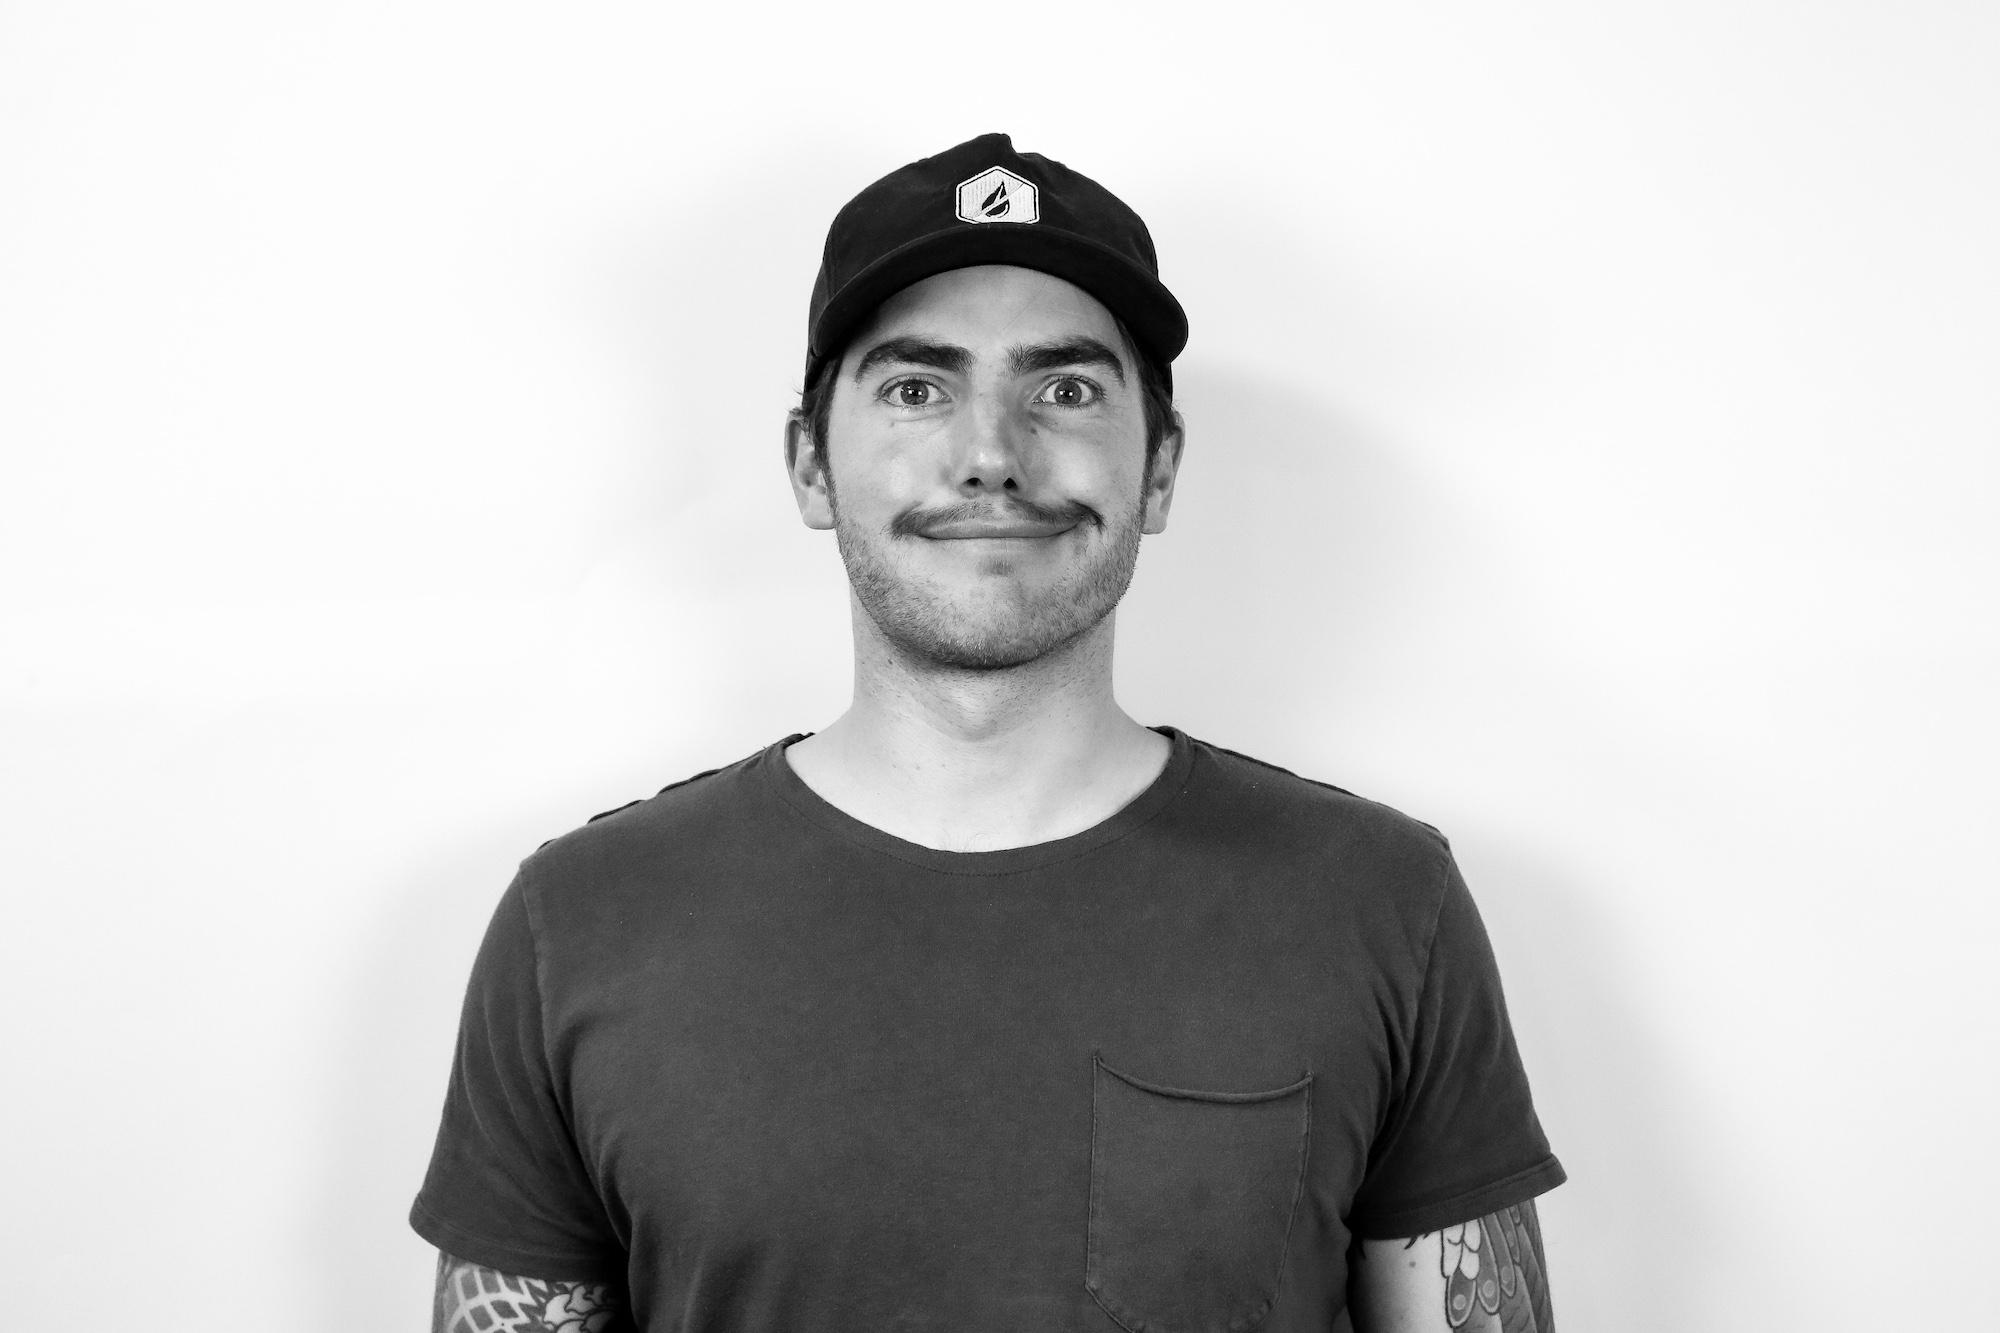 Dominic Rosacci - Superior Ink Owner